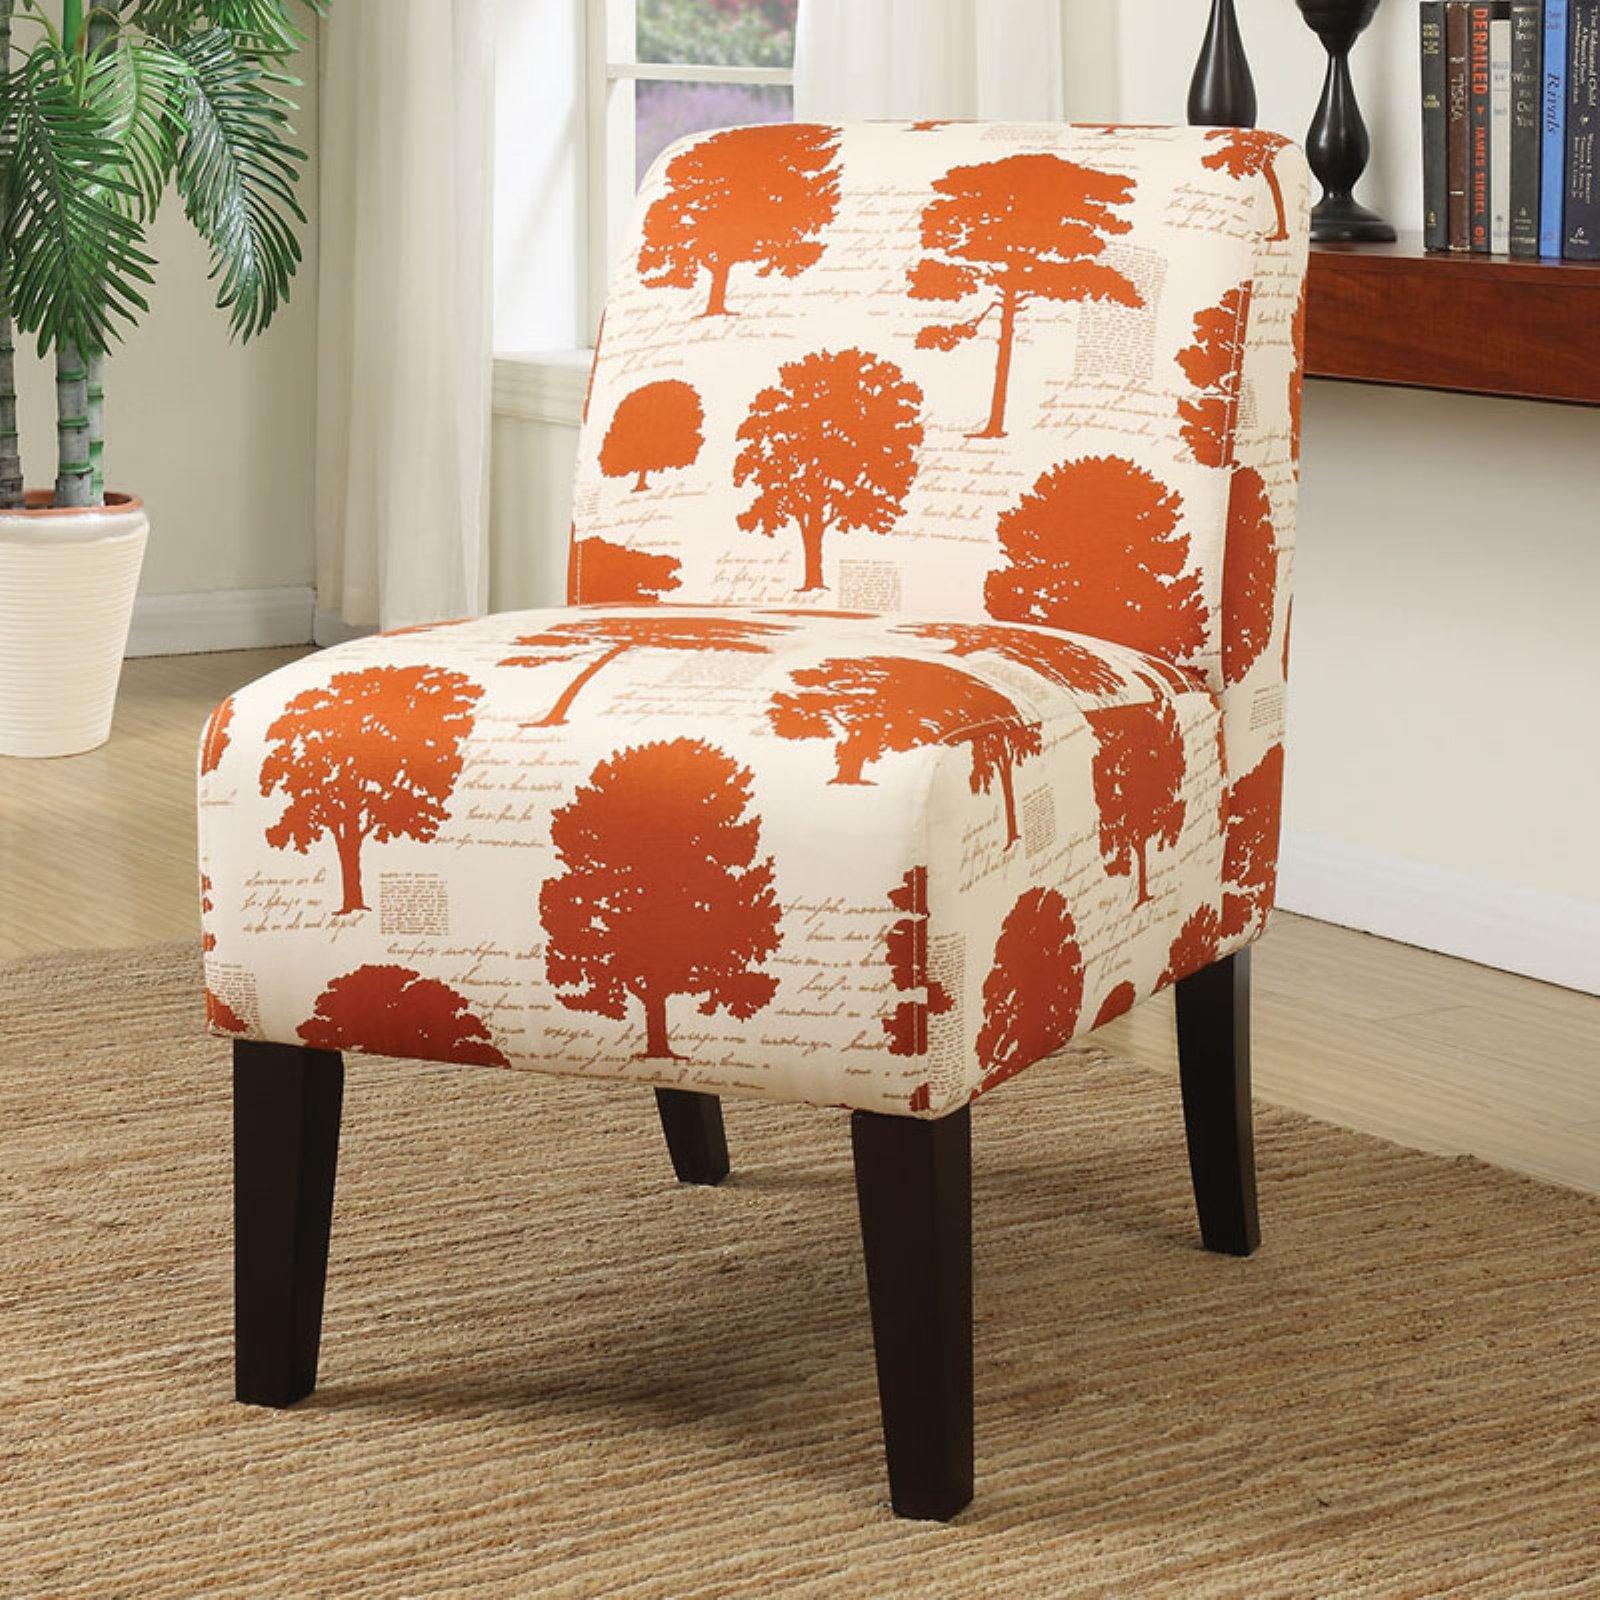 ACME Ollano Fabric Slipper Chair, Multiple Patterns